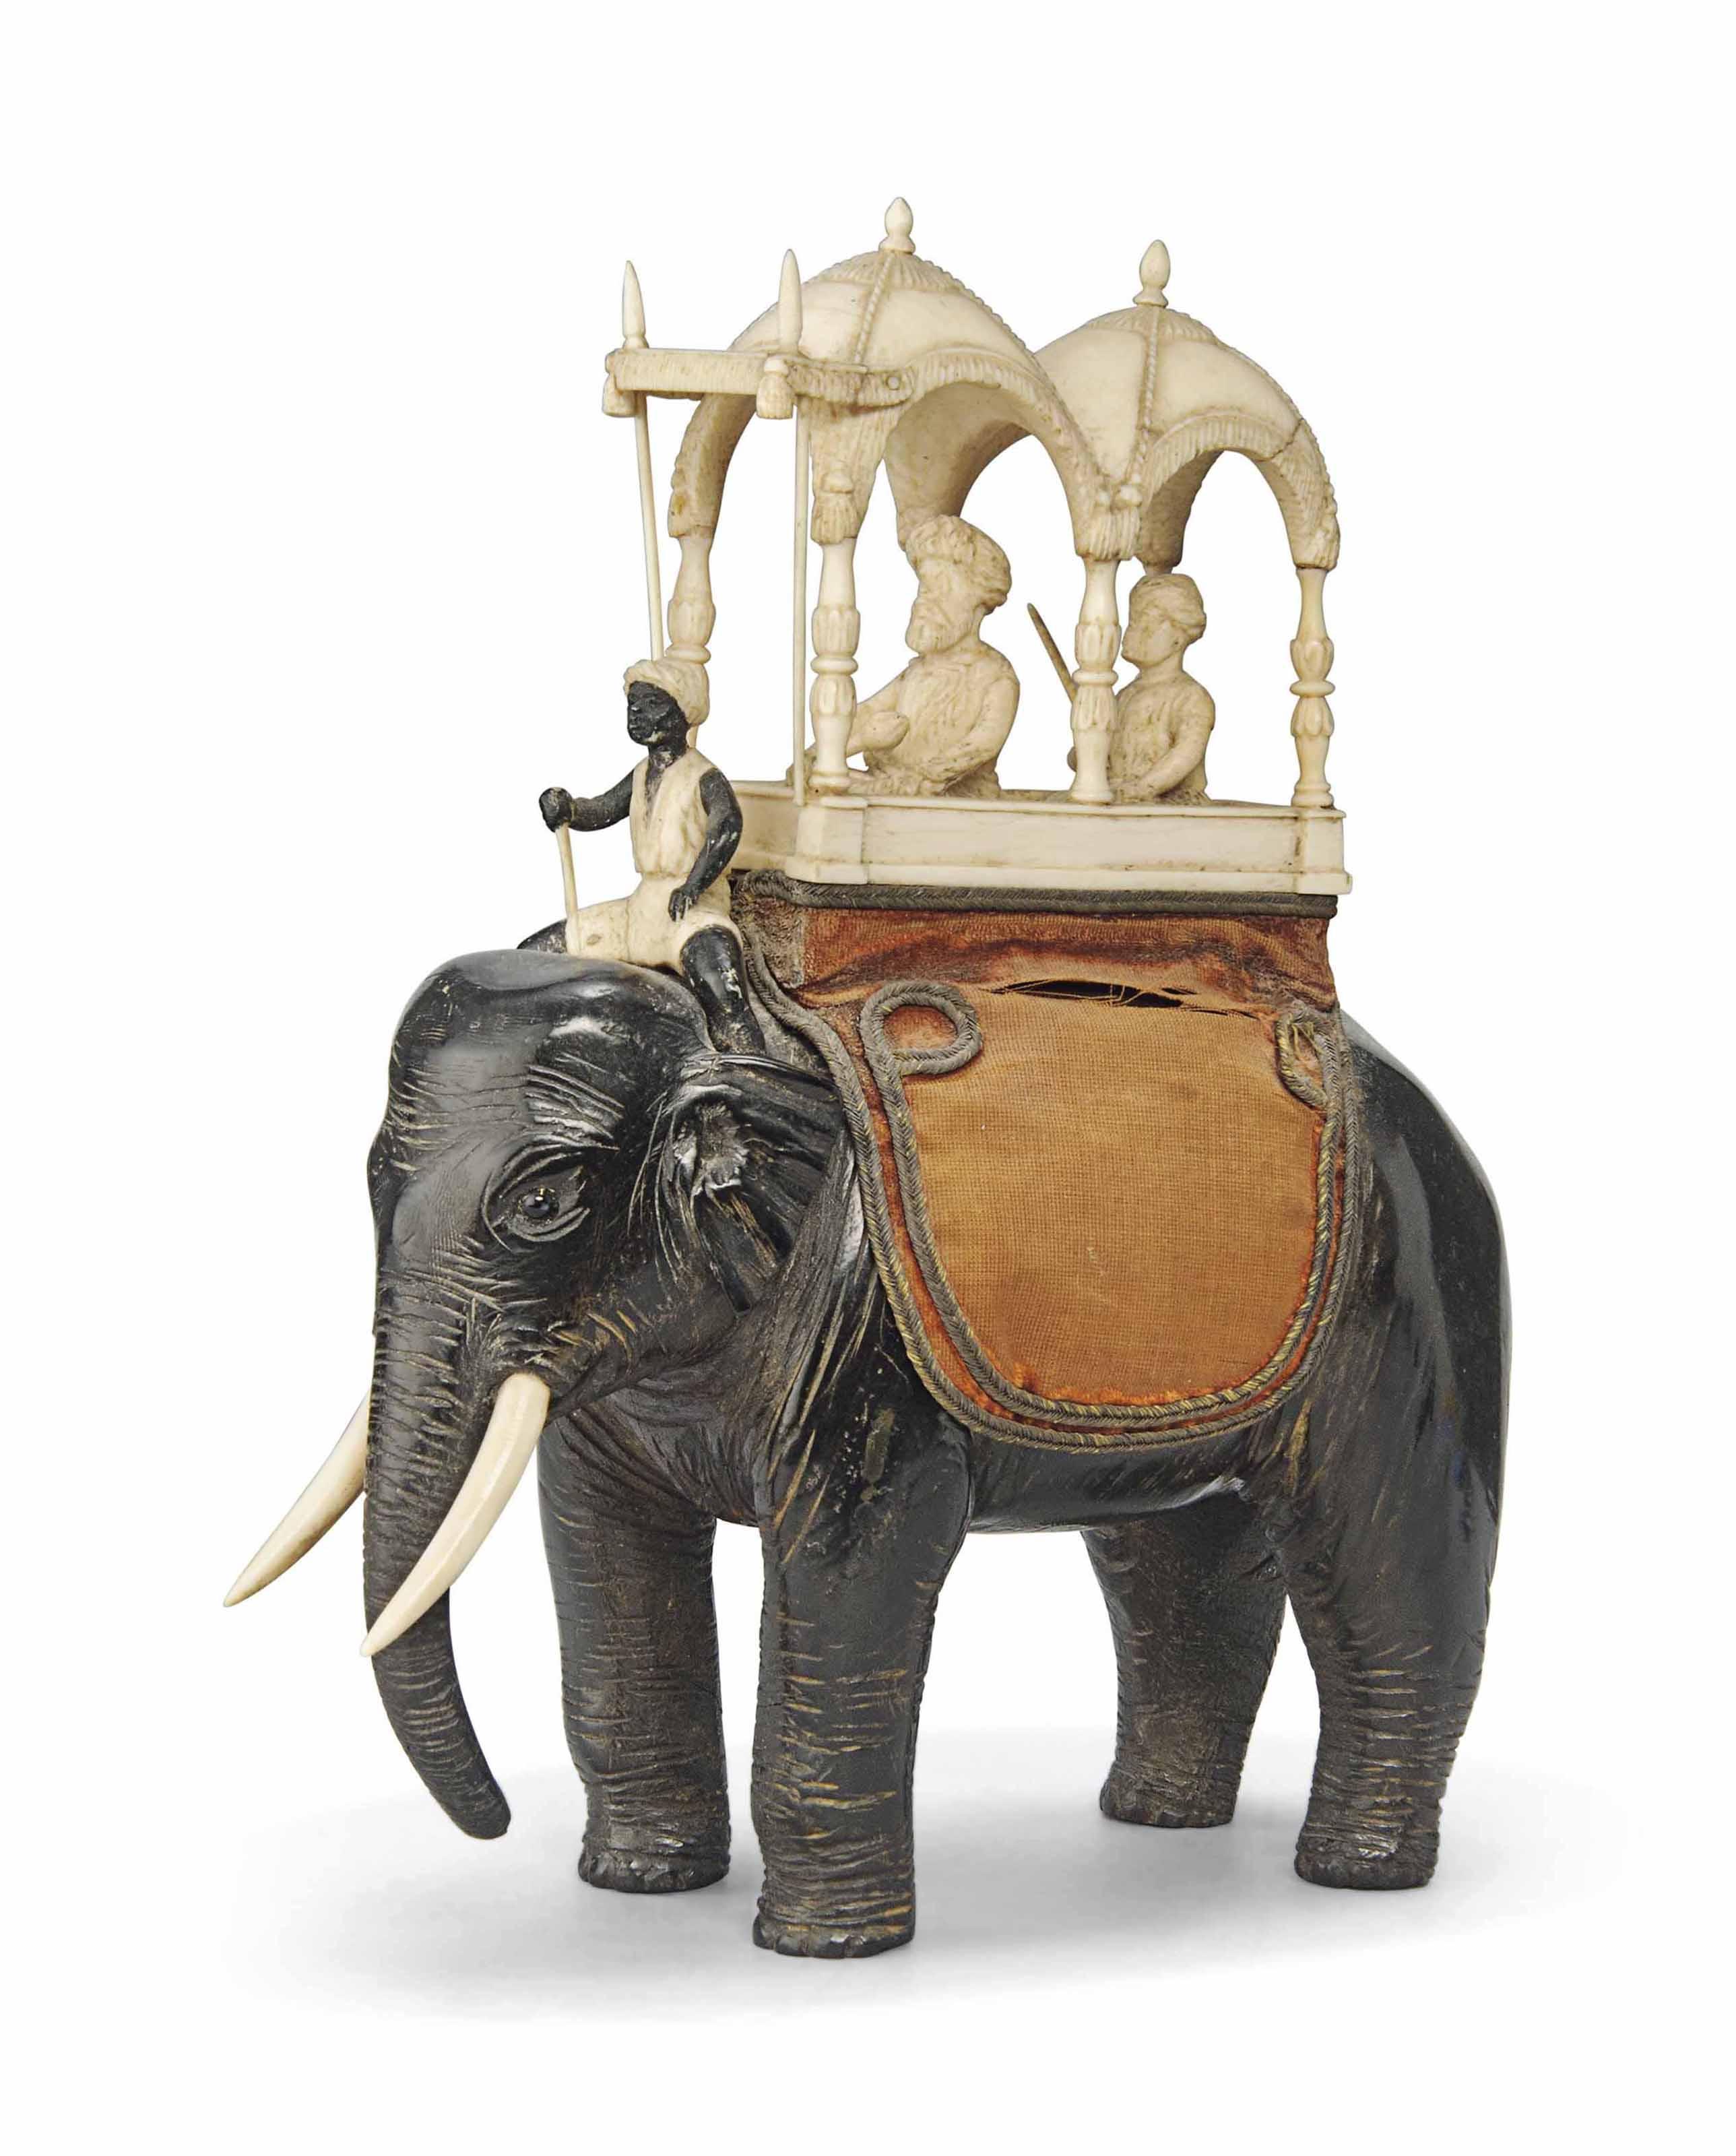 AN INDIAN IVORY MOUNTED EBONY ELEPHANT AND HOWDAH GROUP